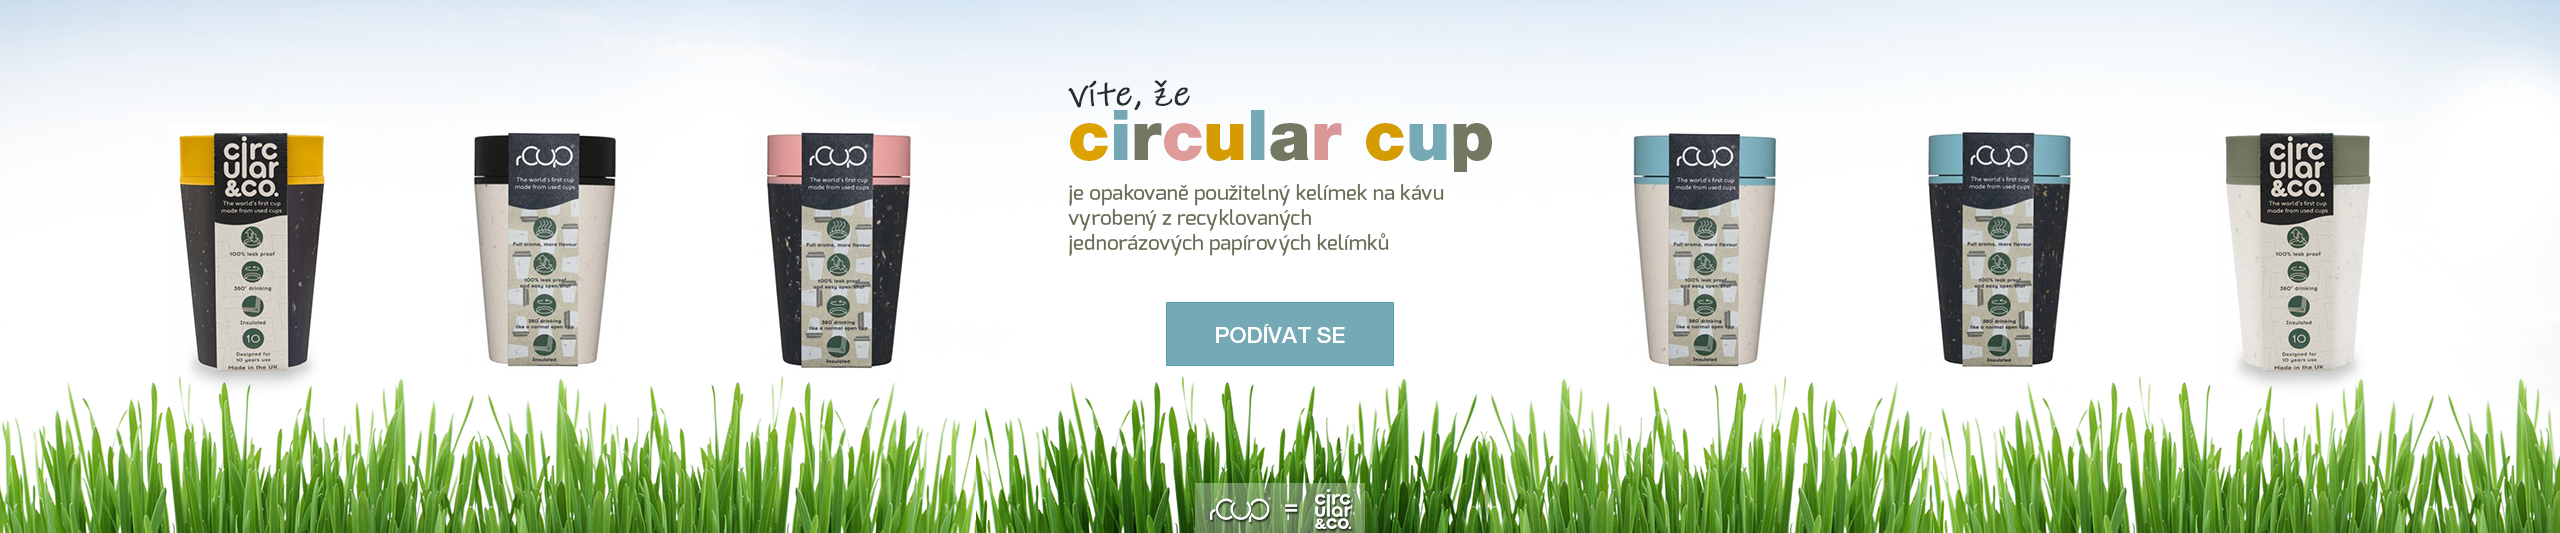 CircularCup